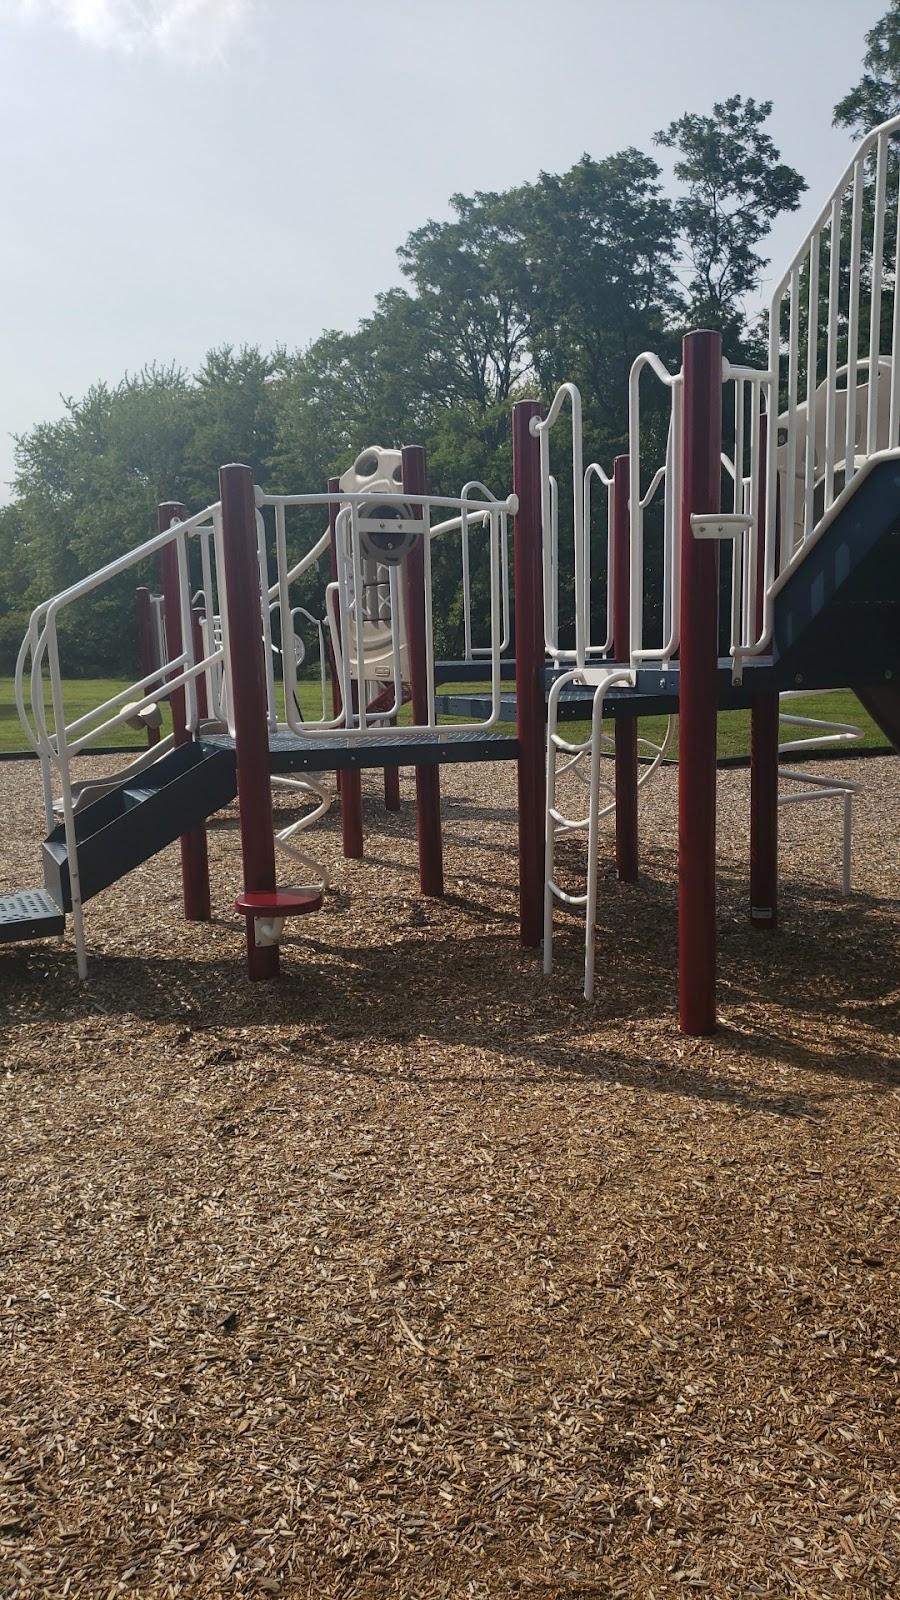 Gilbert Farms Park - park  | Photo 5 of 10 | Address: 6181 Ross Rd, Fairfield, OH 45014, USA | Phone: (513) 867-5348